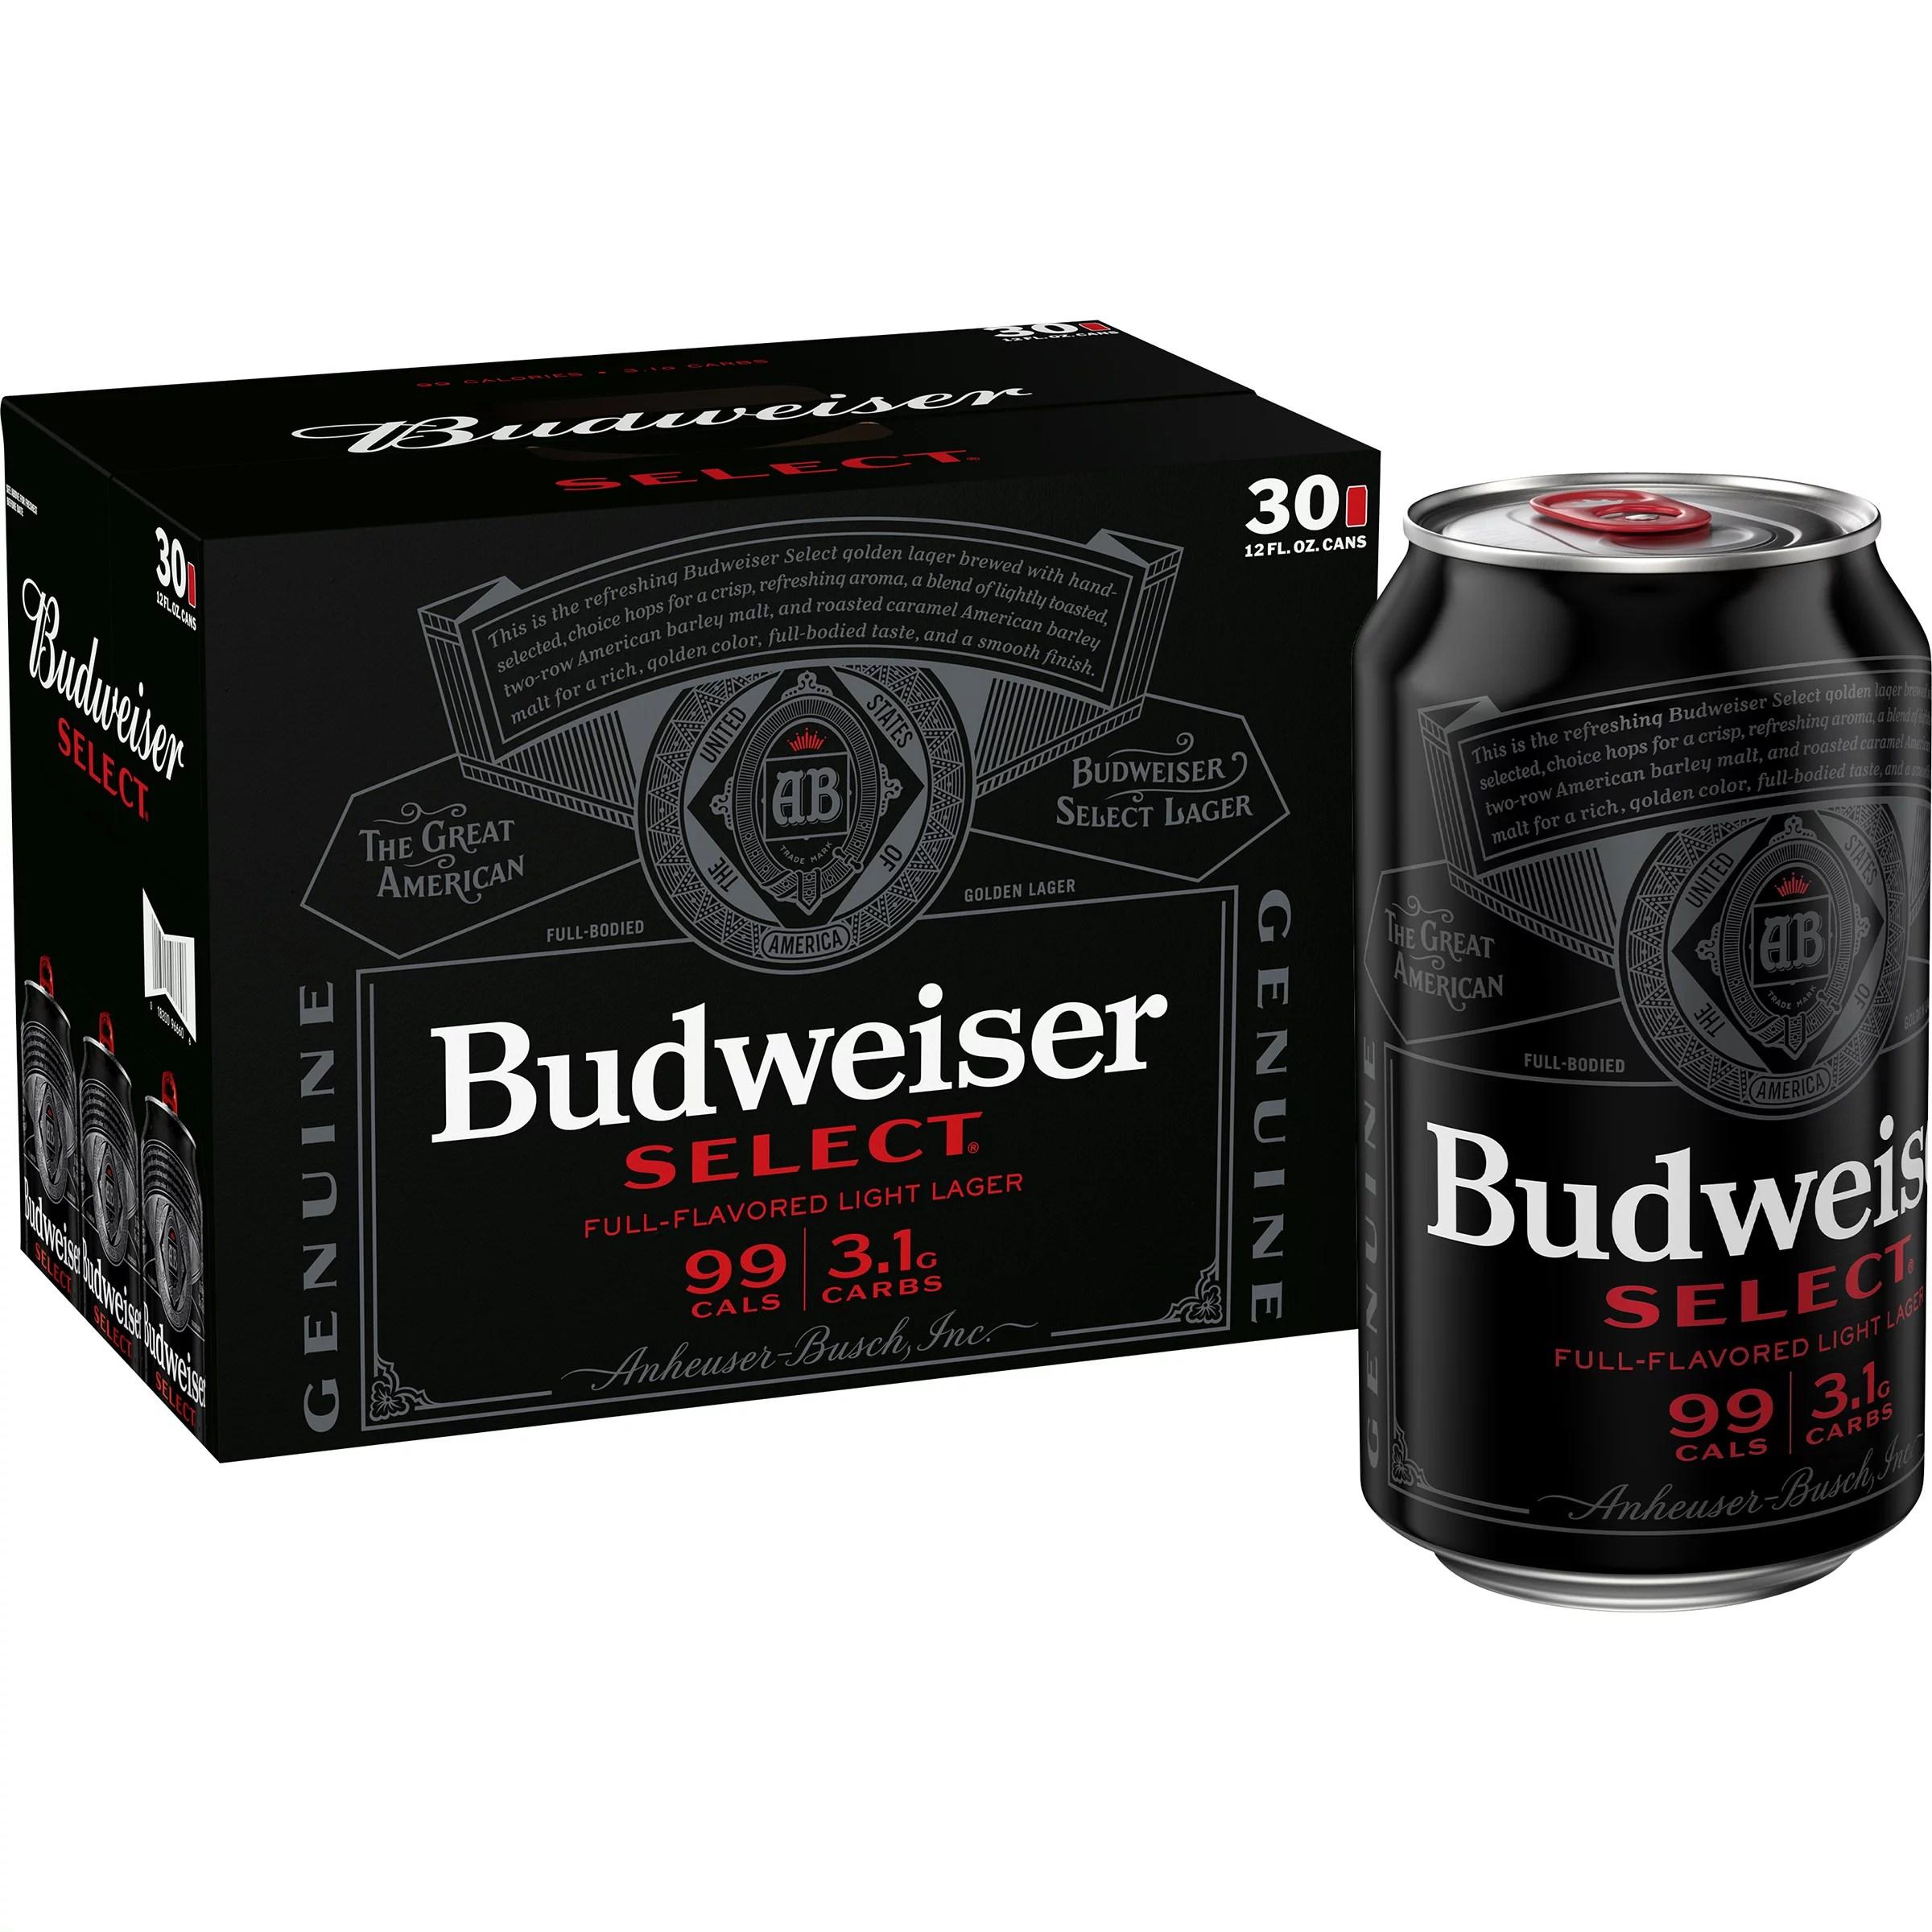 budweiser select light beer 30 pack 12 fl oz cans 4 3 abv walmart com